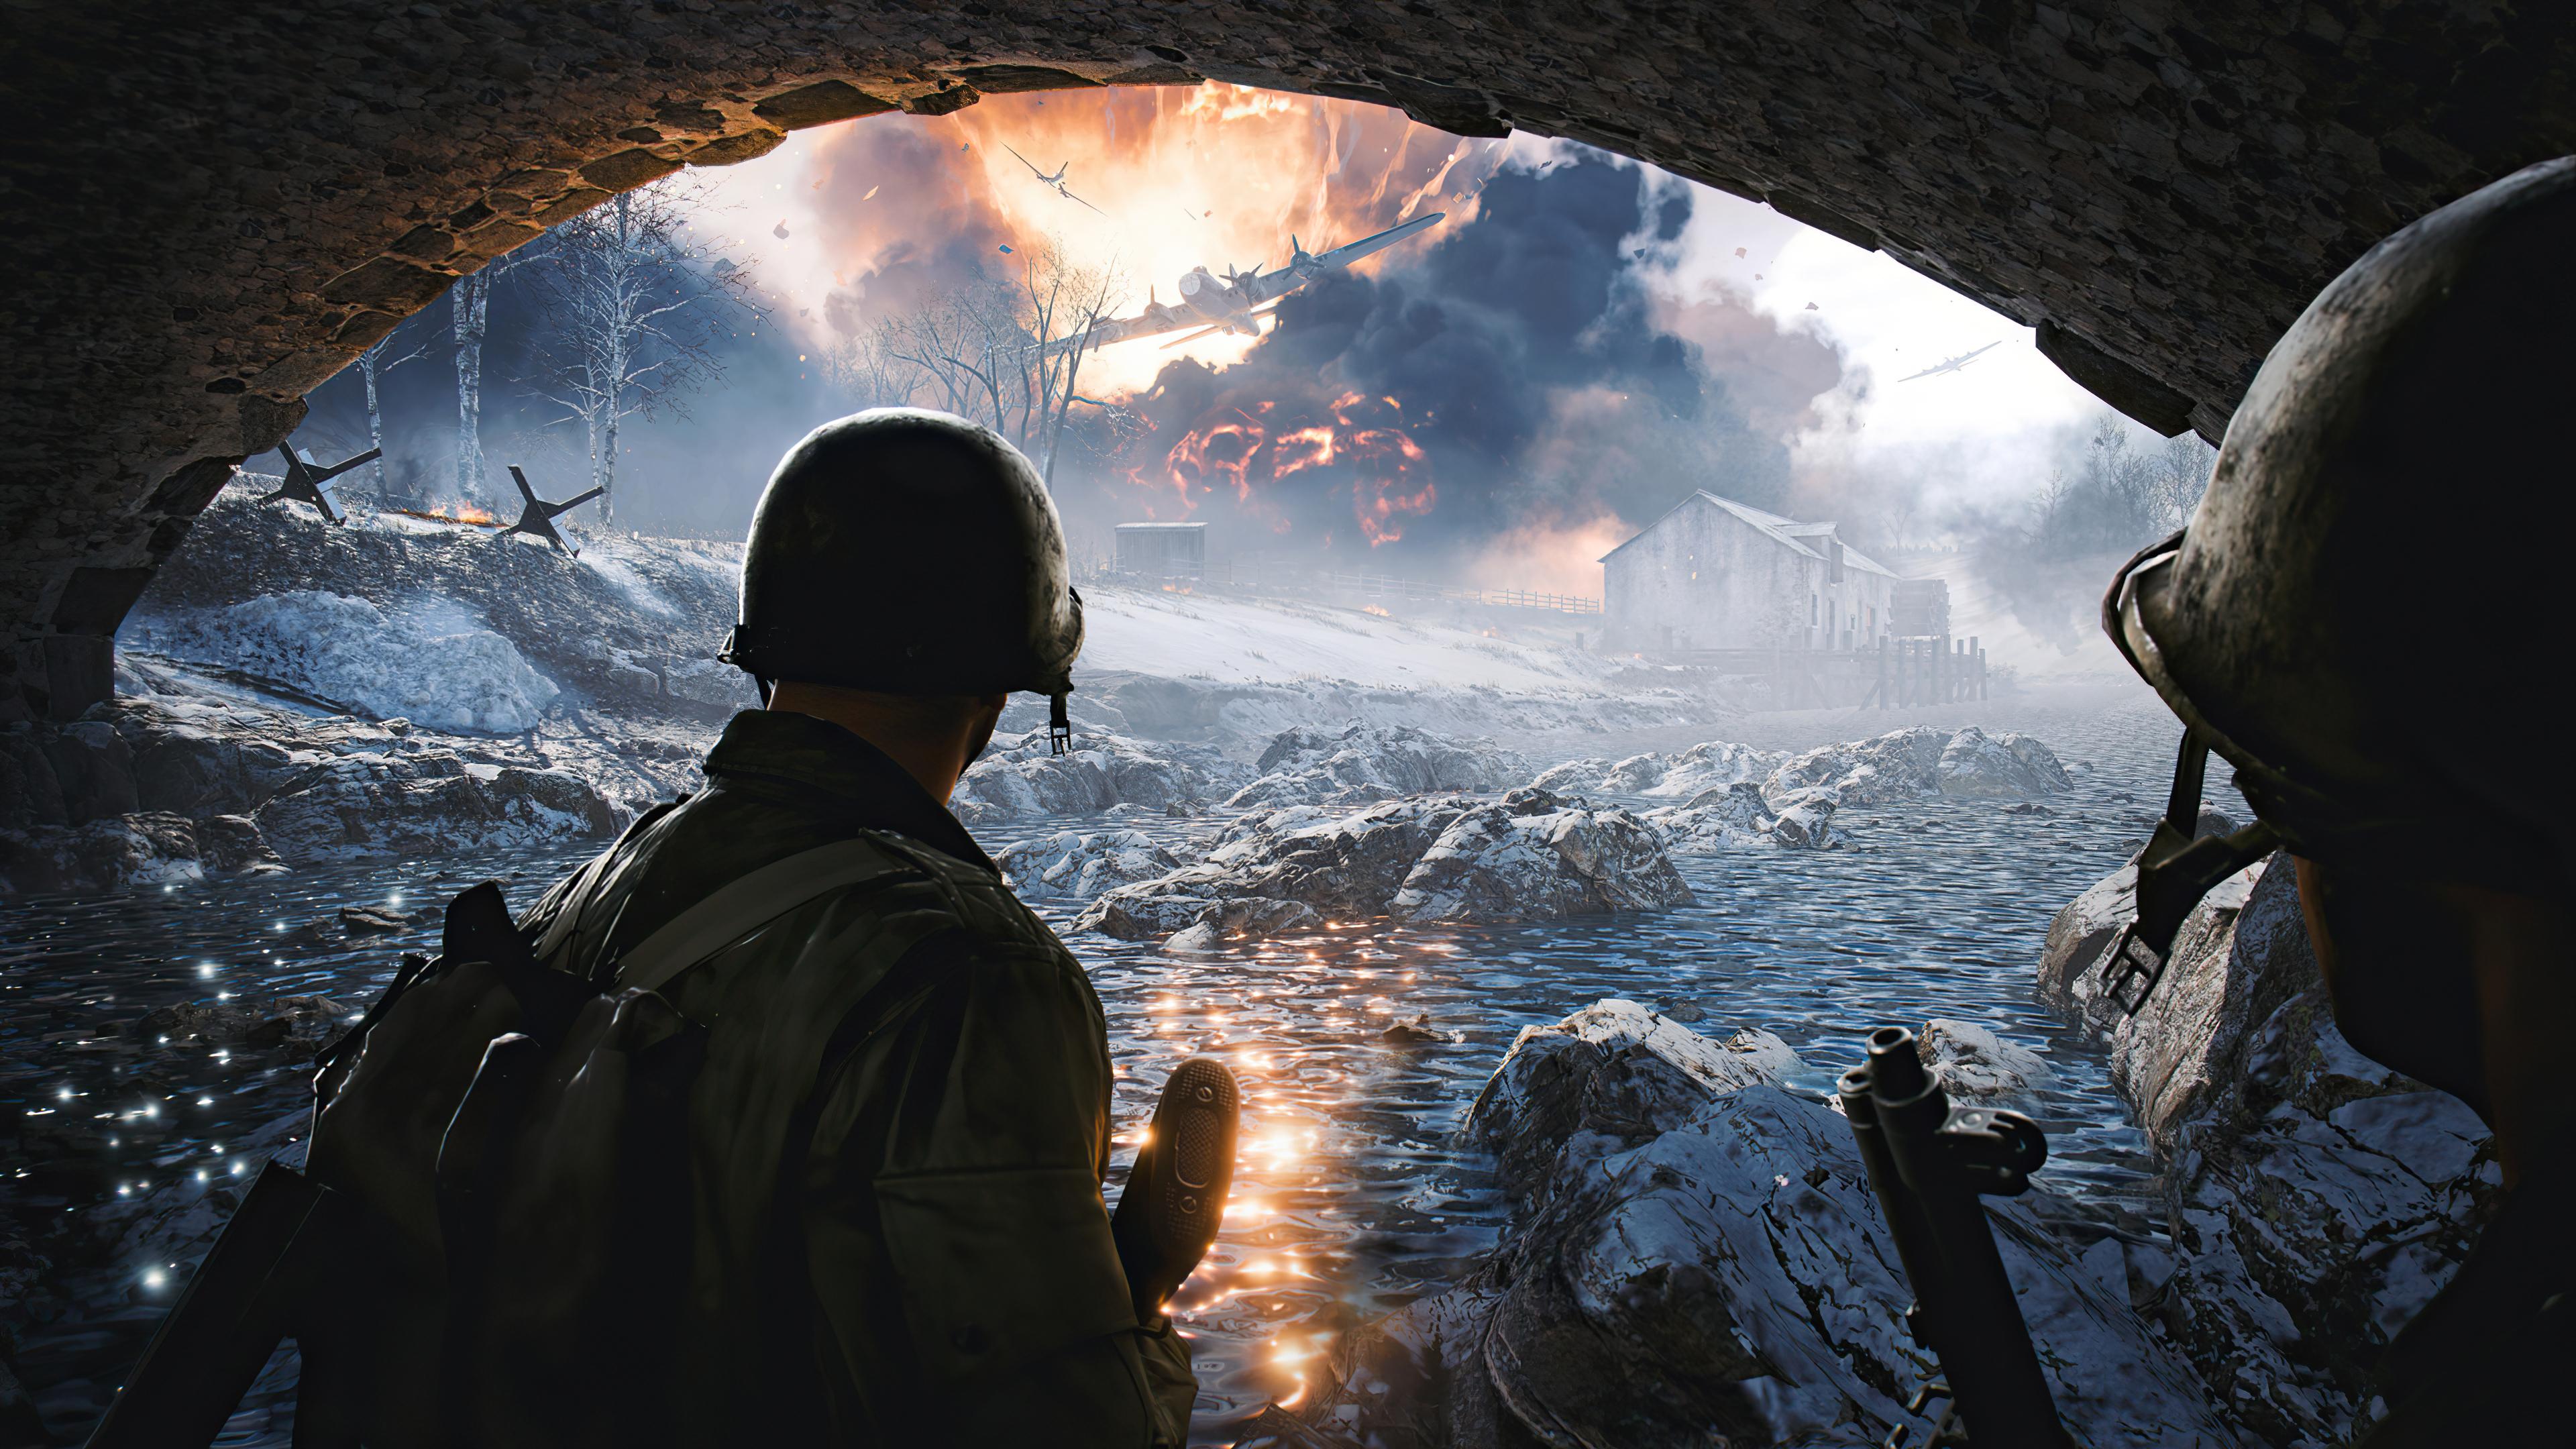 battlefield 2042 4k 1628453489 - Battlefield 2042 4k - Battlefield 2042 4k wallpapers